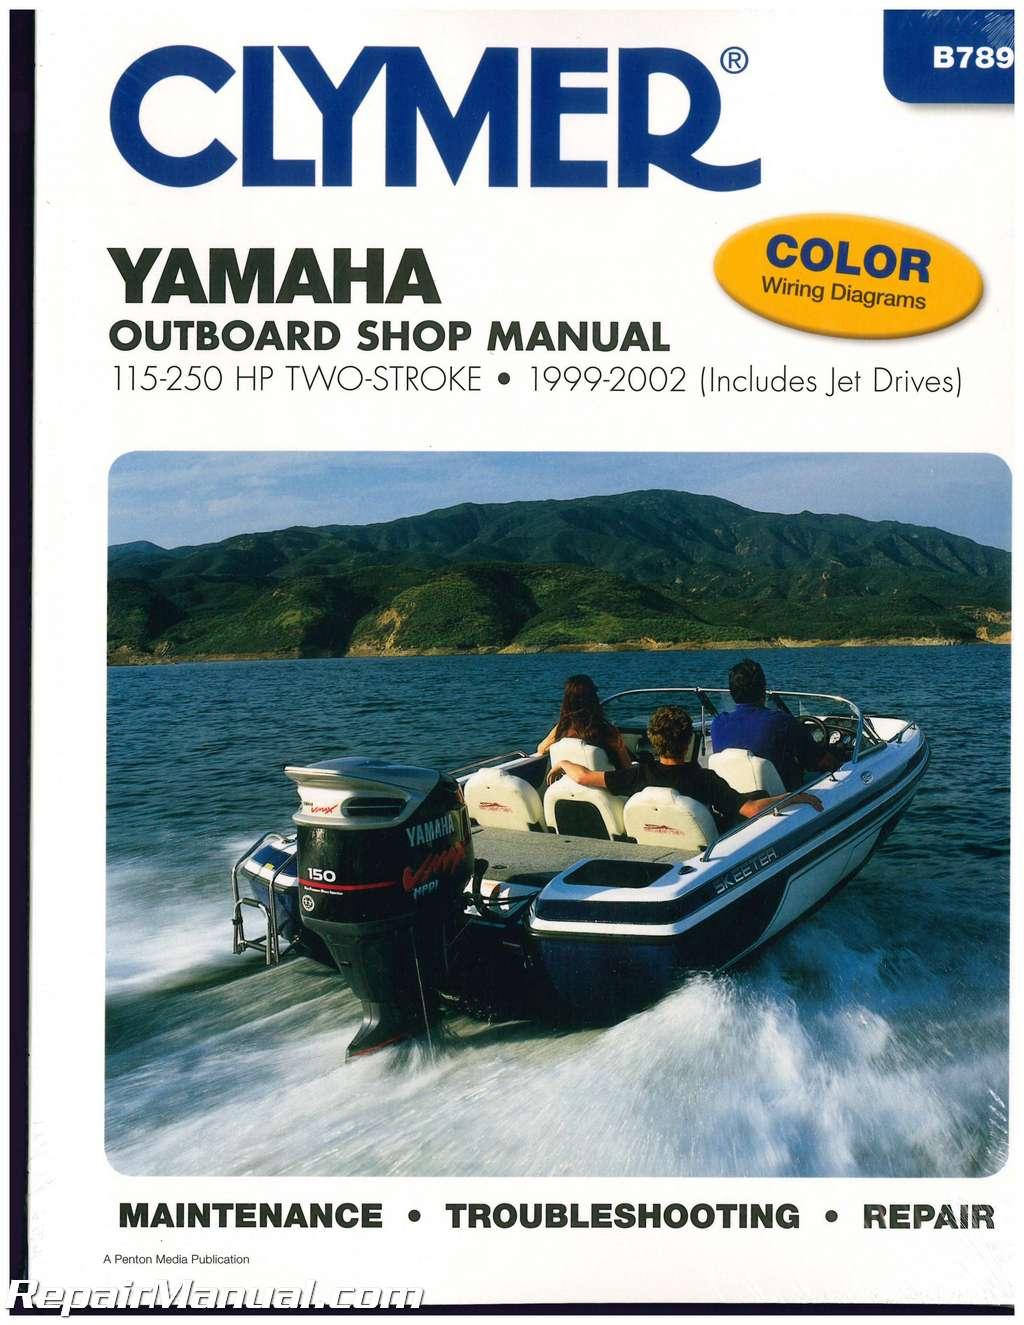 honda 100 outboard service manual